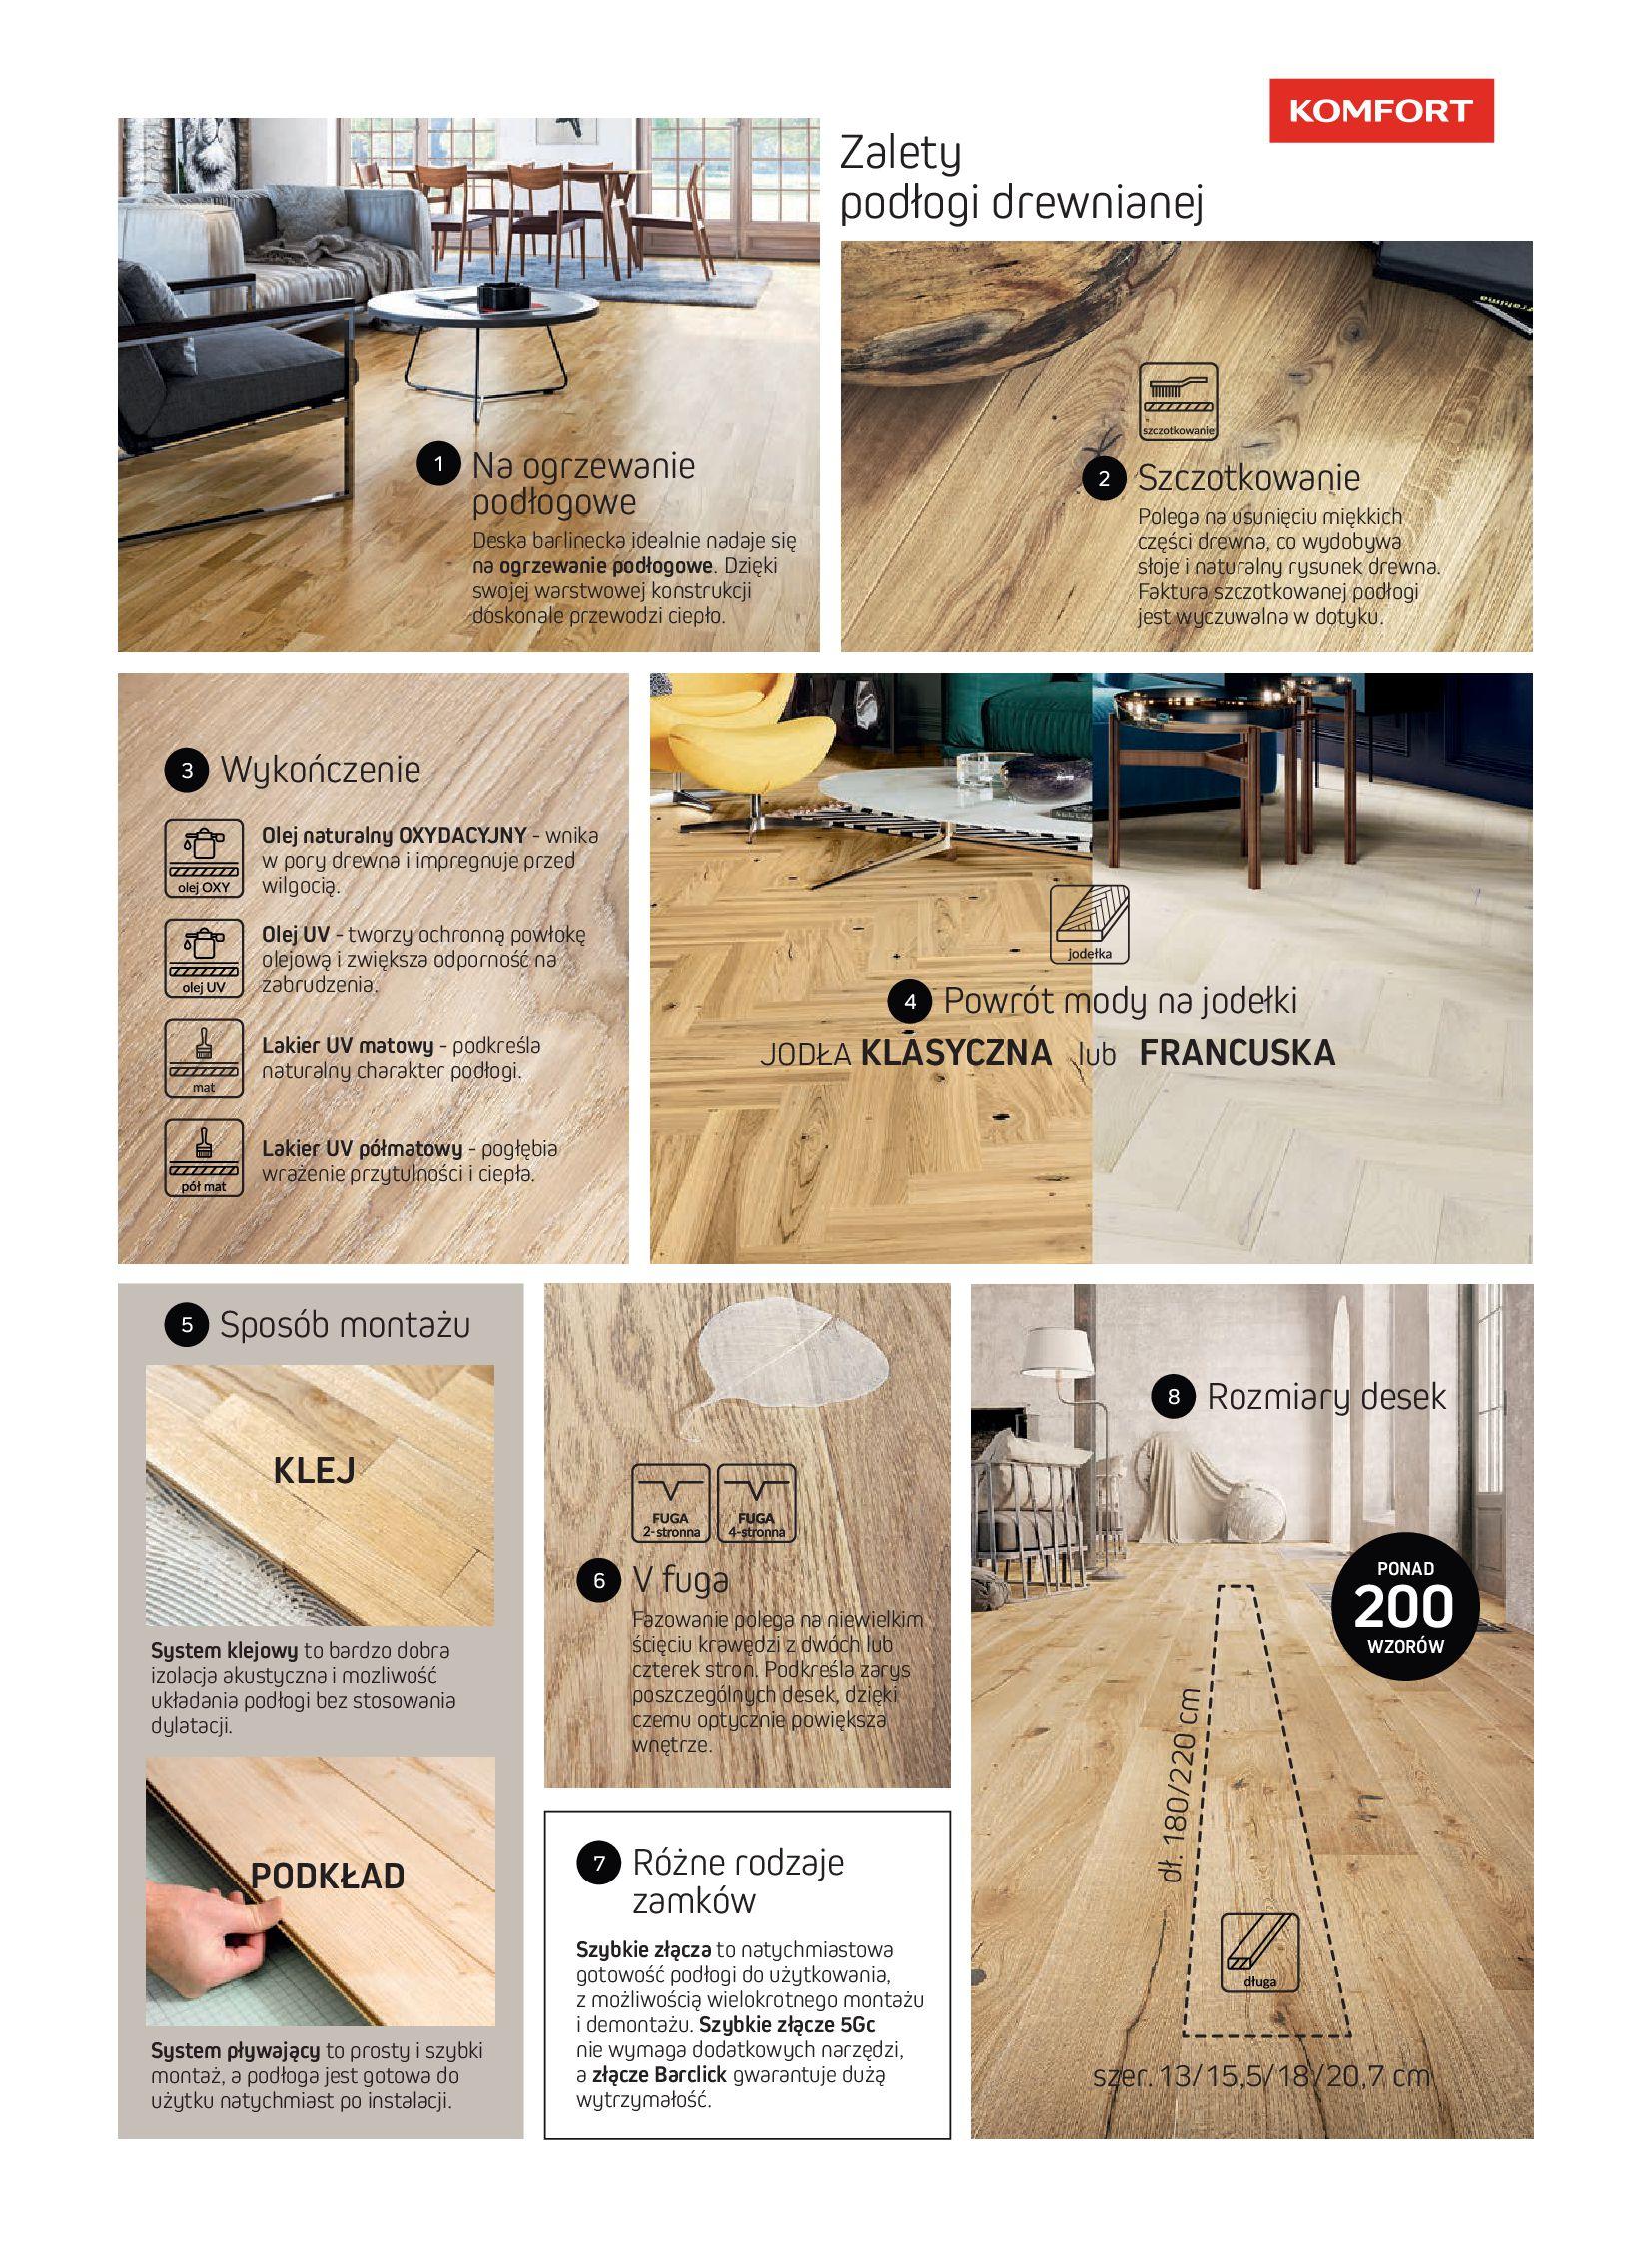 Gazetka Komfort: Gazetka Komfort - Katalog podłogi i drzwi 2021-06-16 page-13